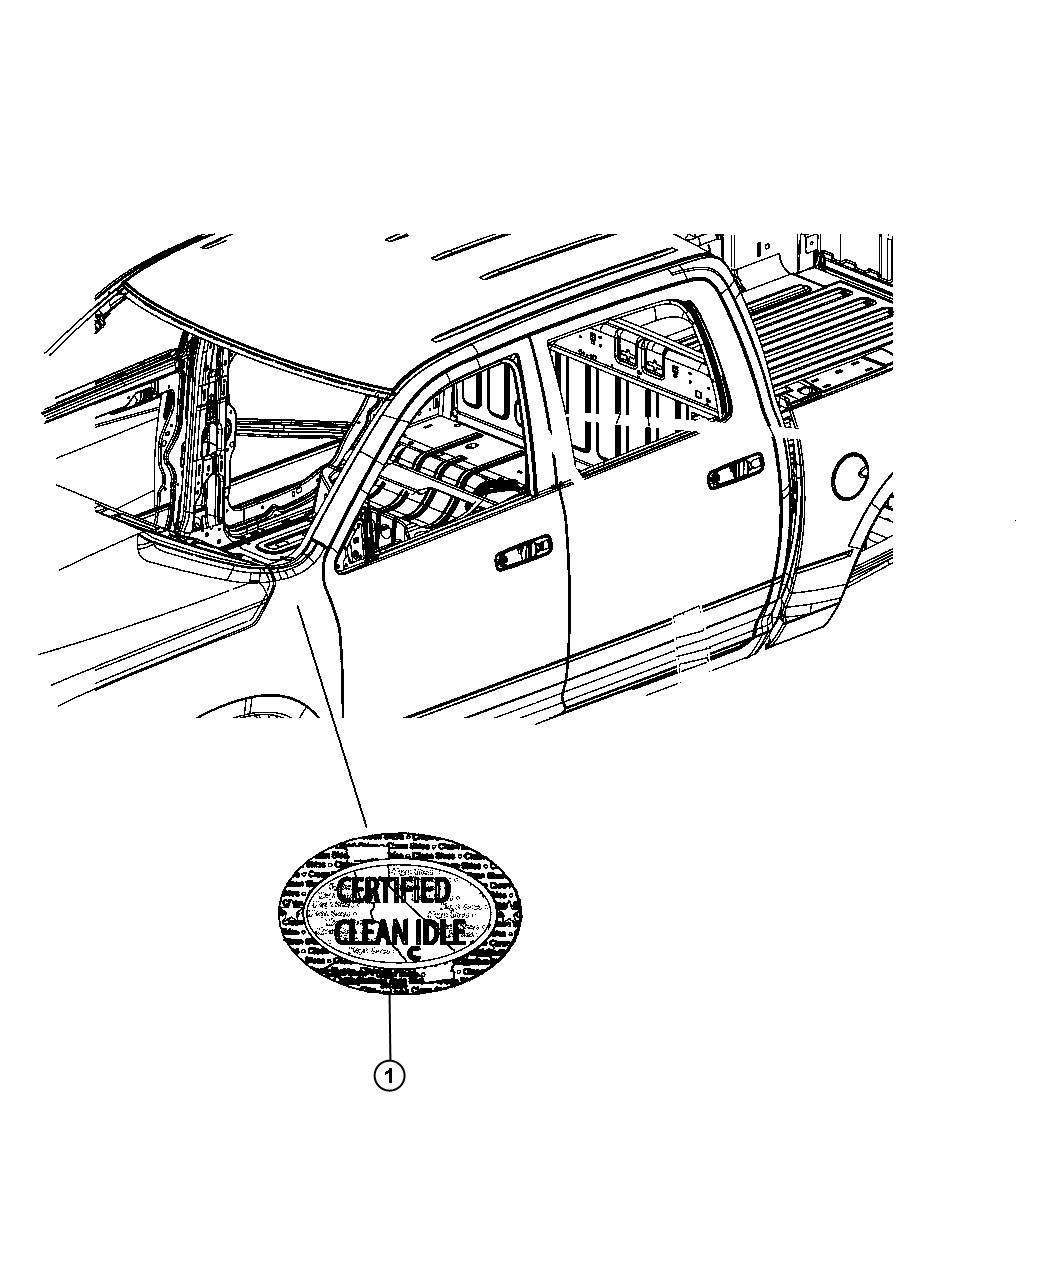 2009 Dodge Ram 5500 Decal, label. Clean idle emissions